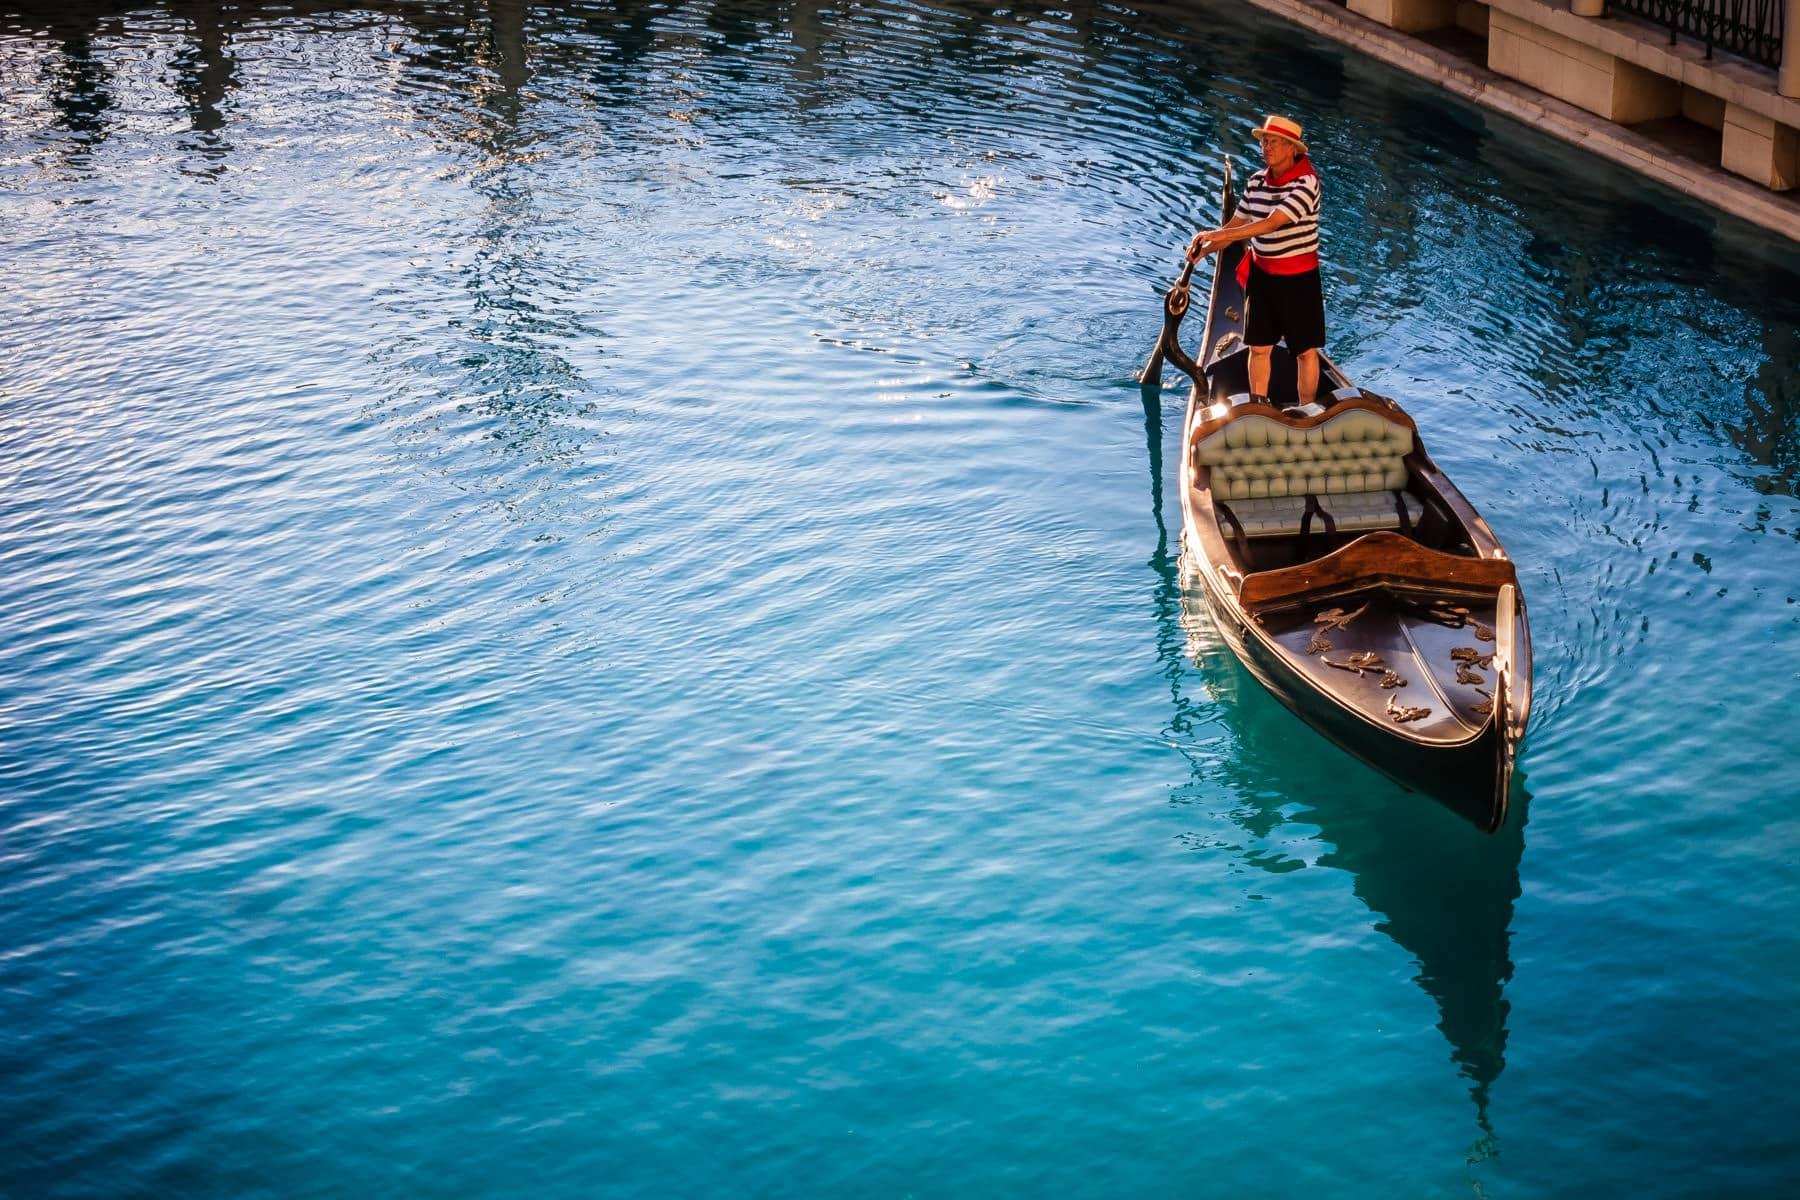 A gondolier steers his gondola at The Venetian, Las Vegas.